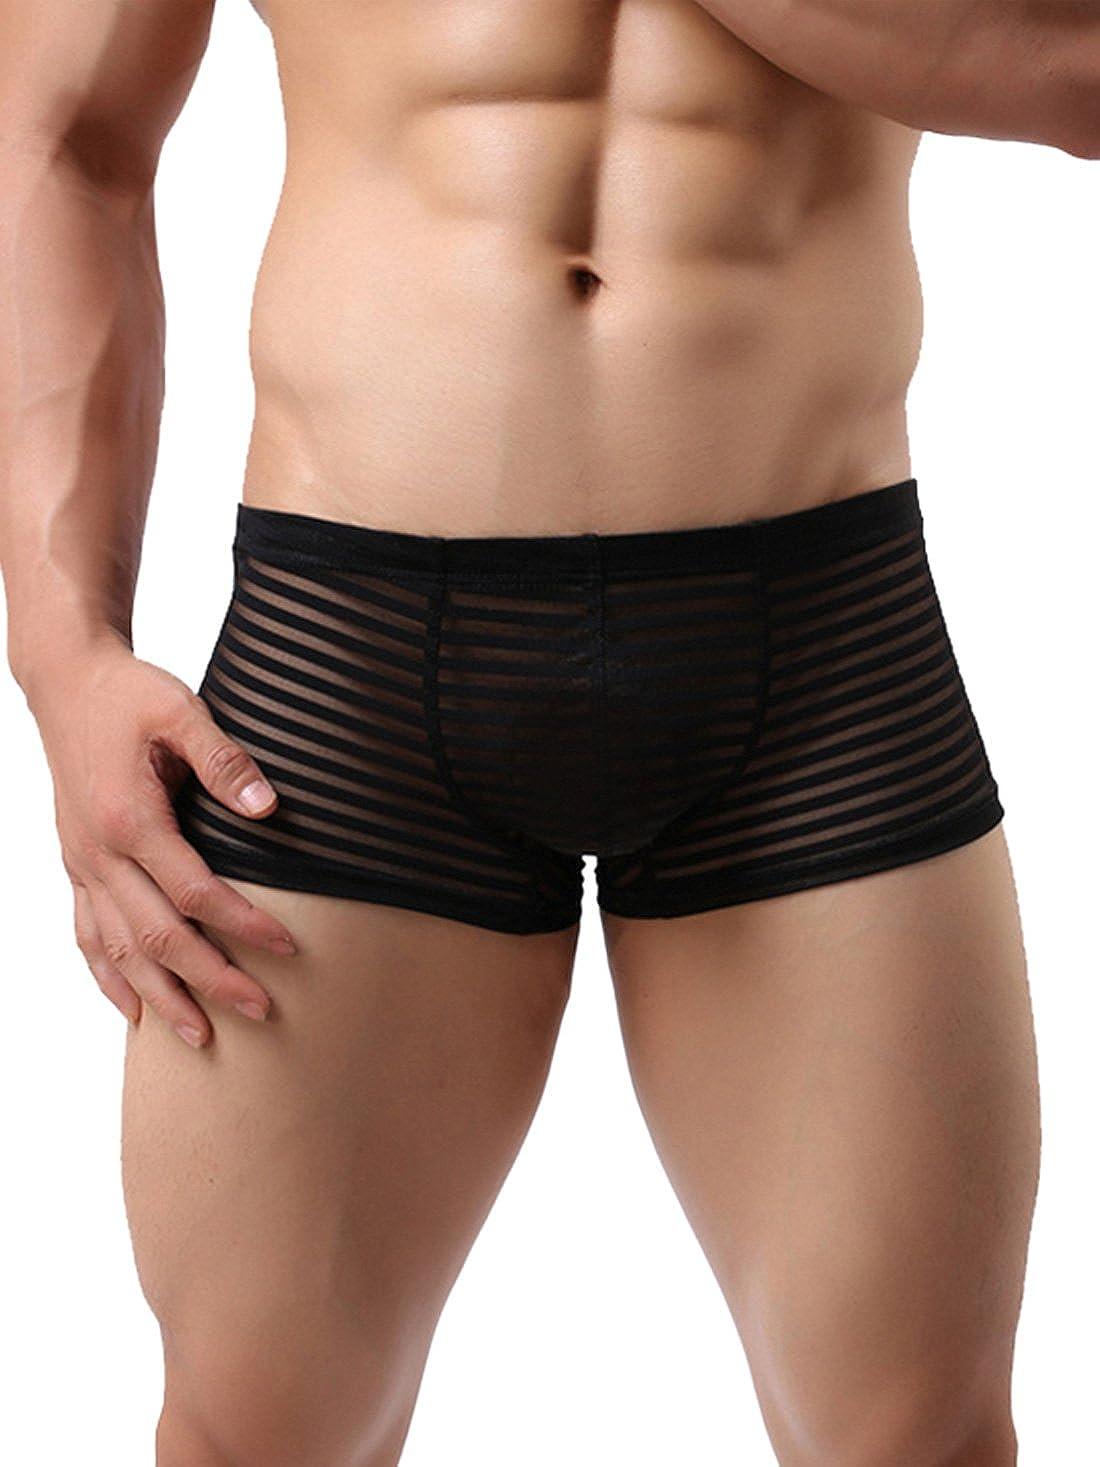 TALLA L / ES 38-40. Neiyiku Calzoncillos Bóxer Briefs para Hombres con Rayas Transparentes Slip Transpirable Cómodo Ligera